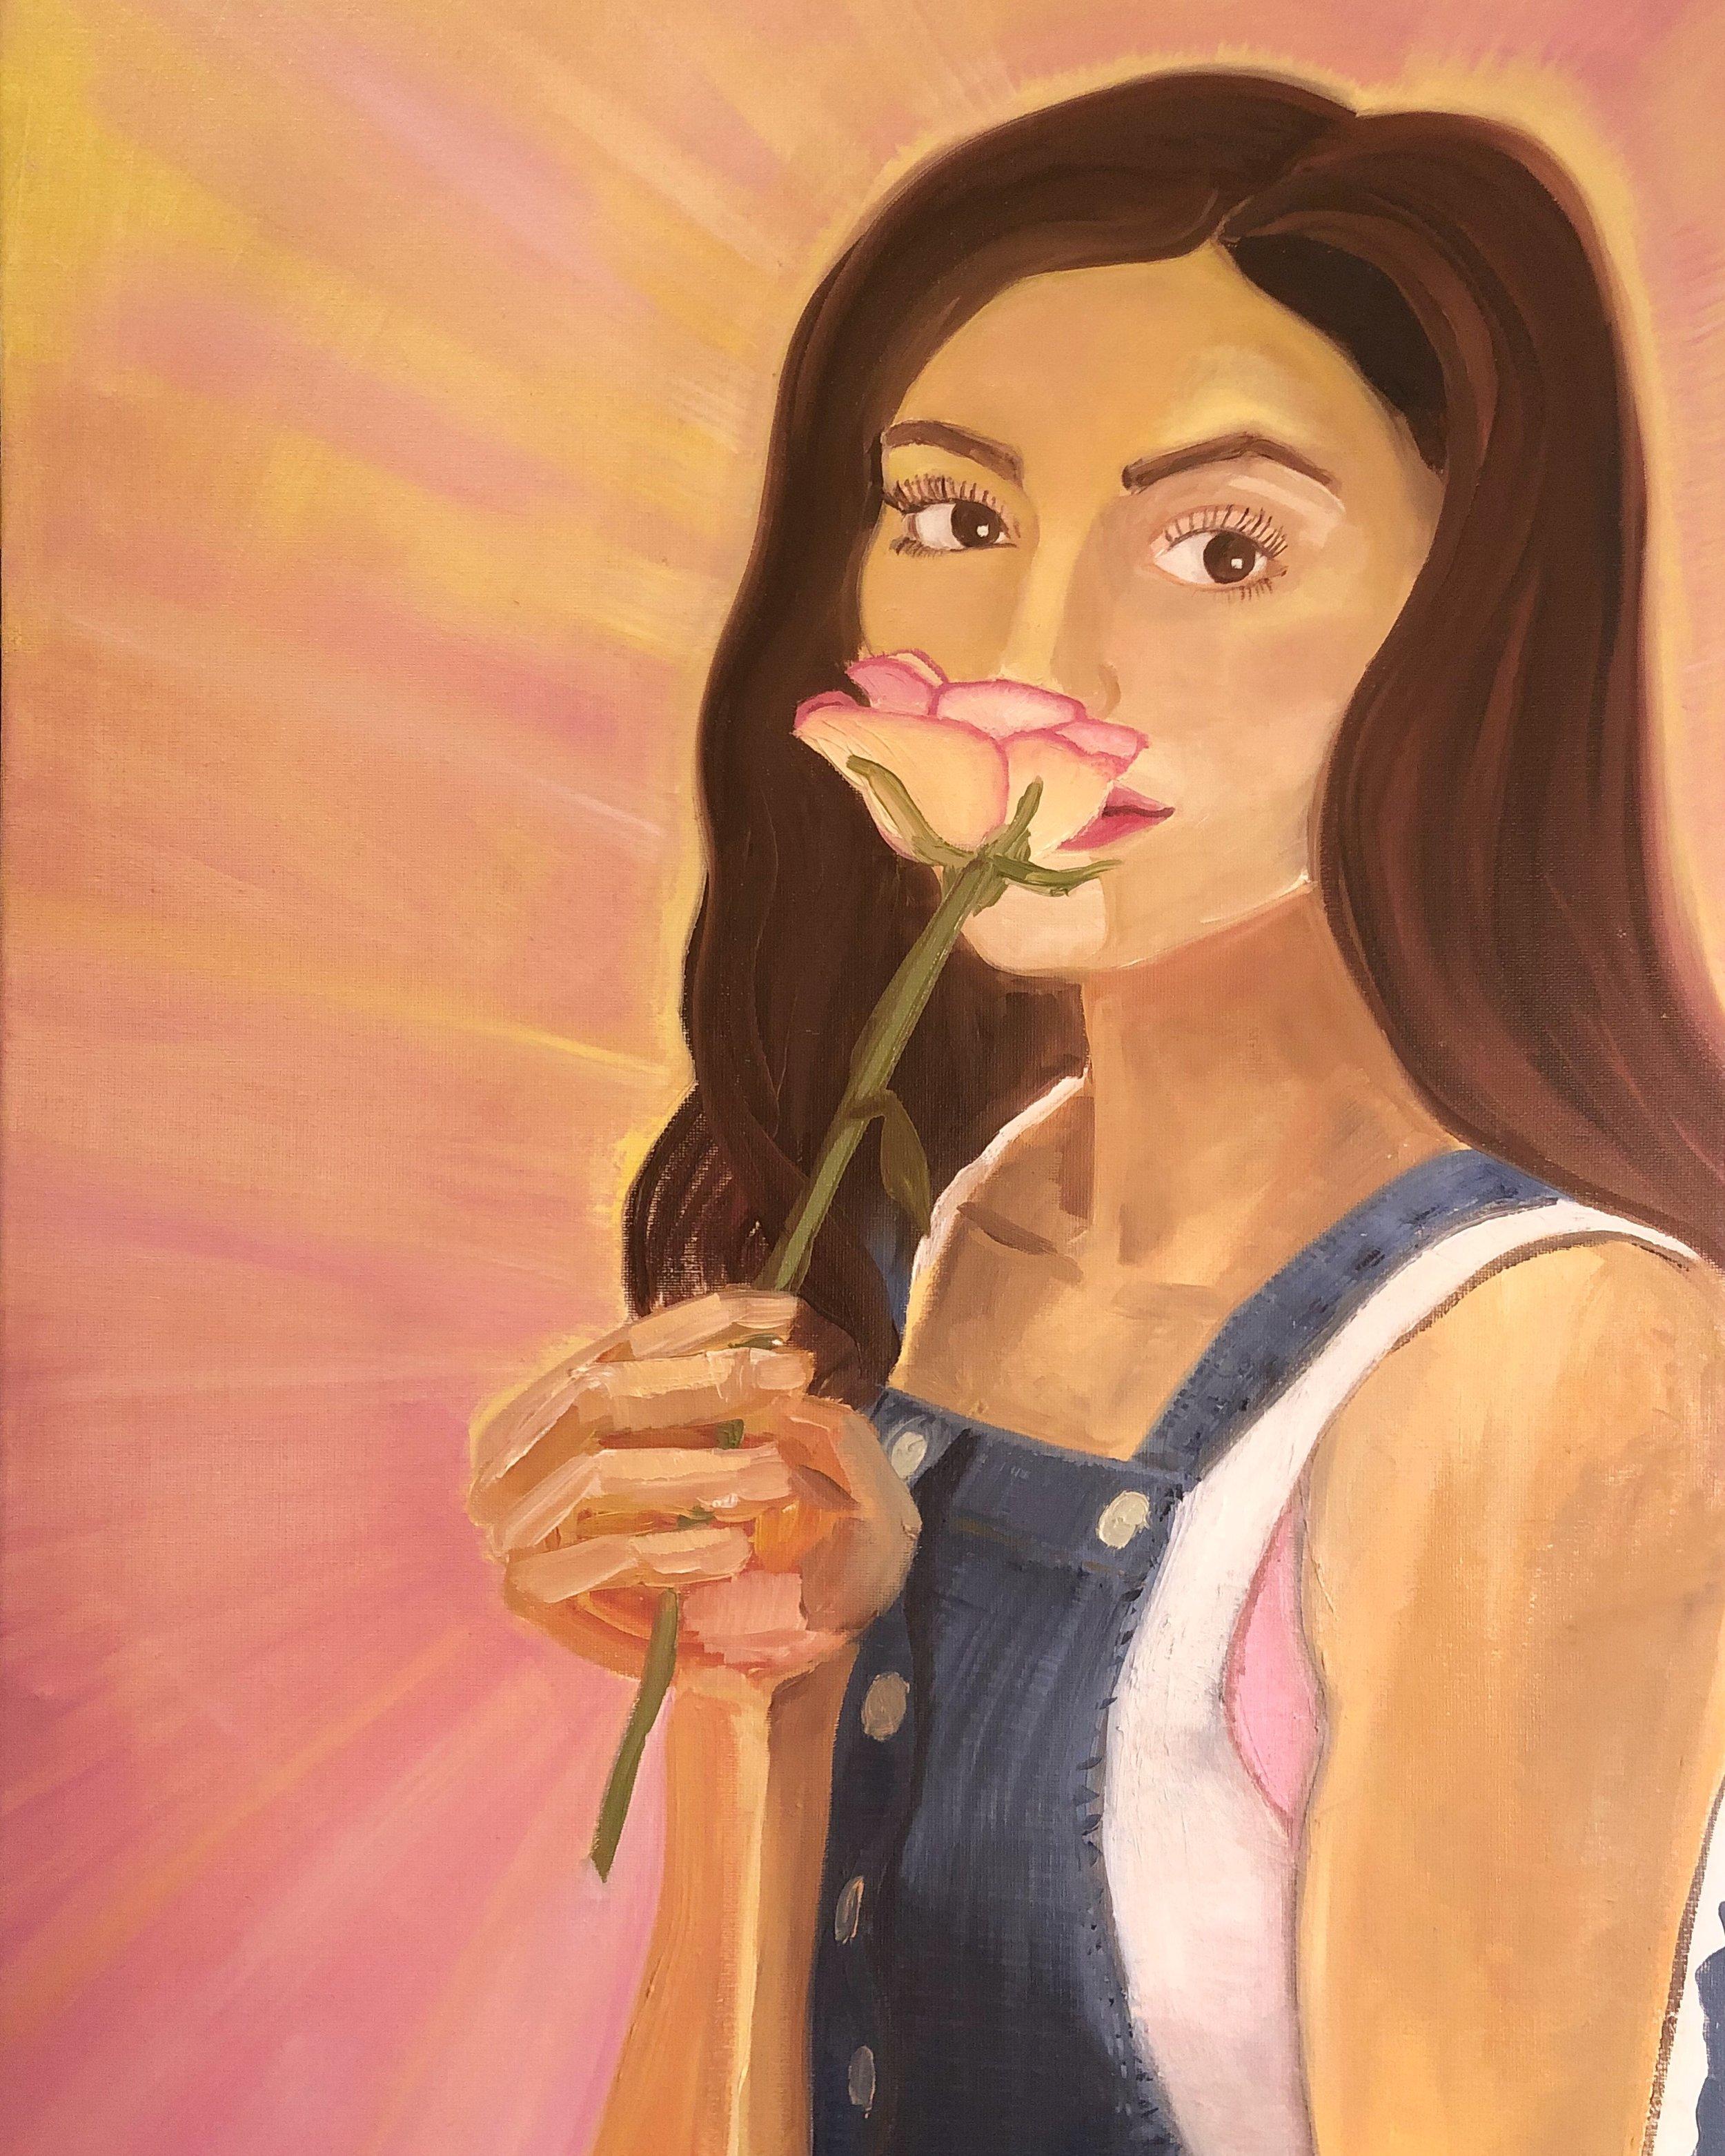 katrina-eugenia-live-painting-live-artist-live-art-philosophy-philosophy-skincare-love-philosophy-pure-grace-amazing-grace-ballet-rose.JPG